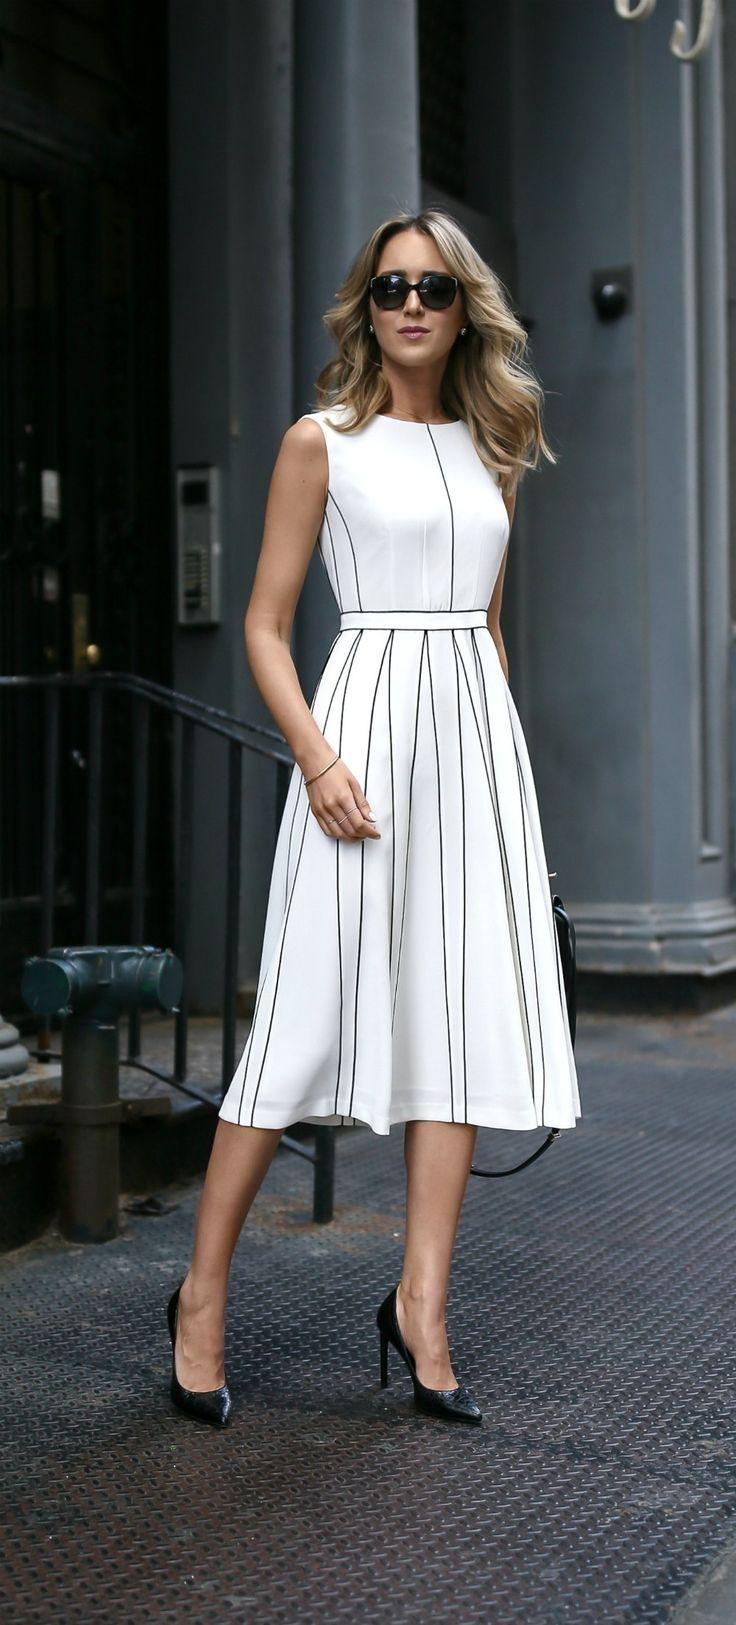 White Pleated Sleeveless A Line Midi Dress With Black